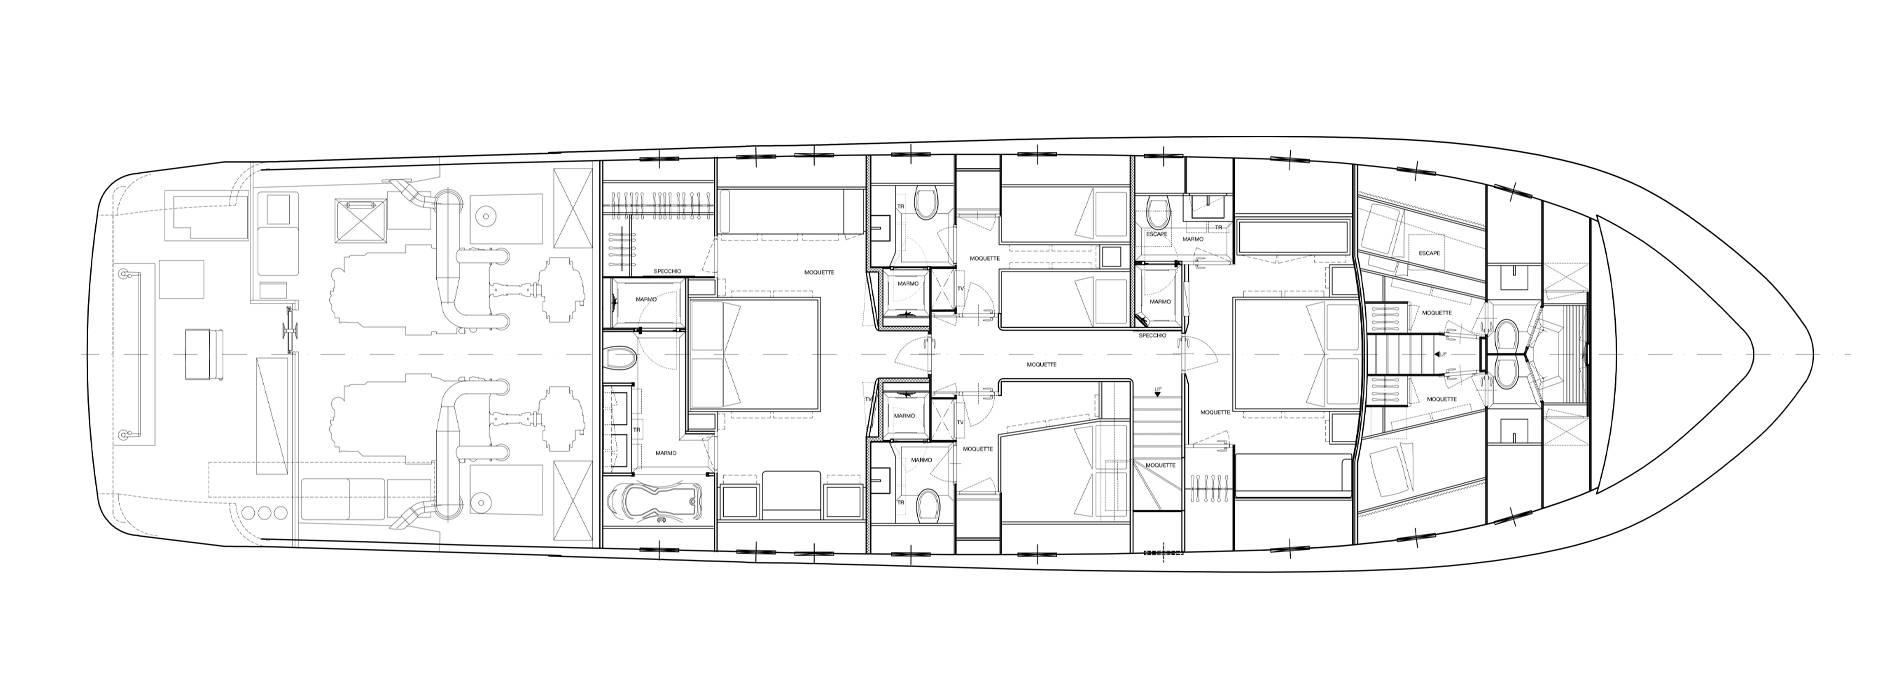 Sanlorenzo Yachts SL88-541 下层甲板